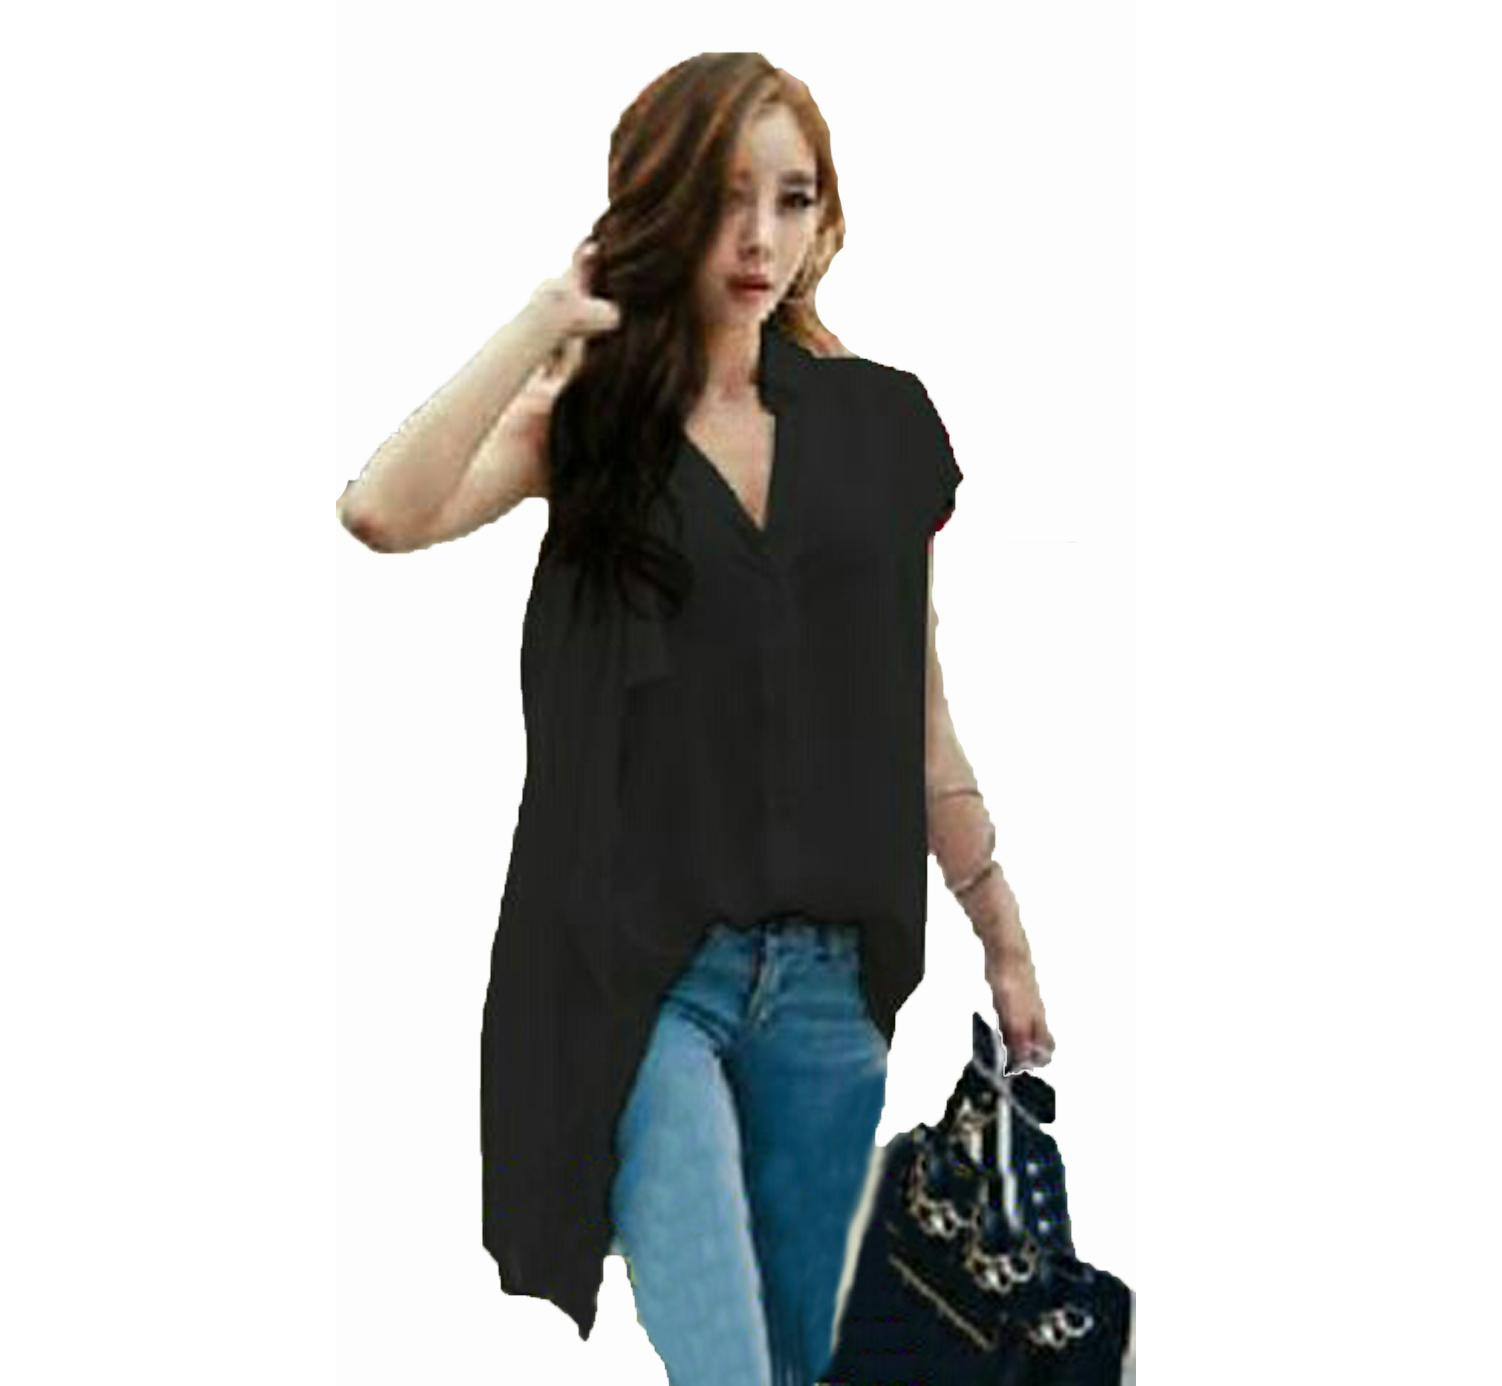 OTIN FASHION BAJU MUSLIM WANITA CASANDRA SALUR. IDR 47,300 IDR47300. View Detail. Ayu Fashion Dress Casandra - Hitam - Best Seller